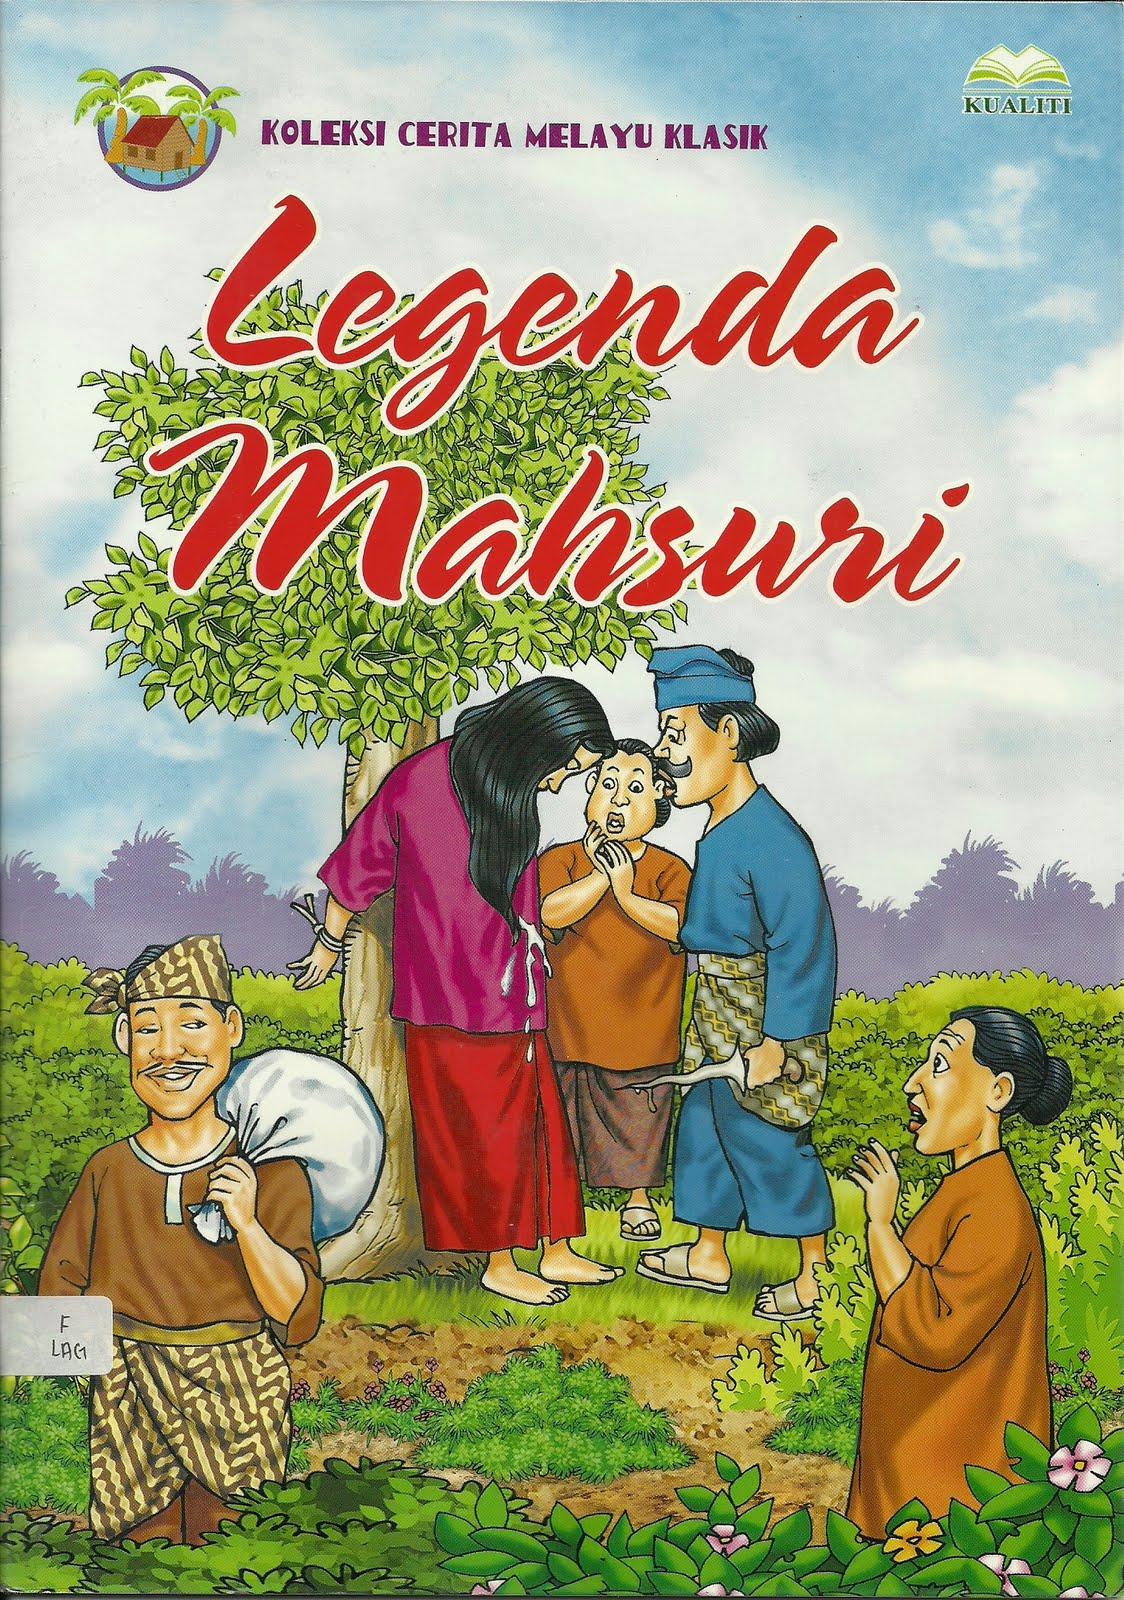 Buku Ally Lagenda Mahsuri